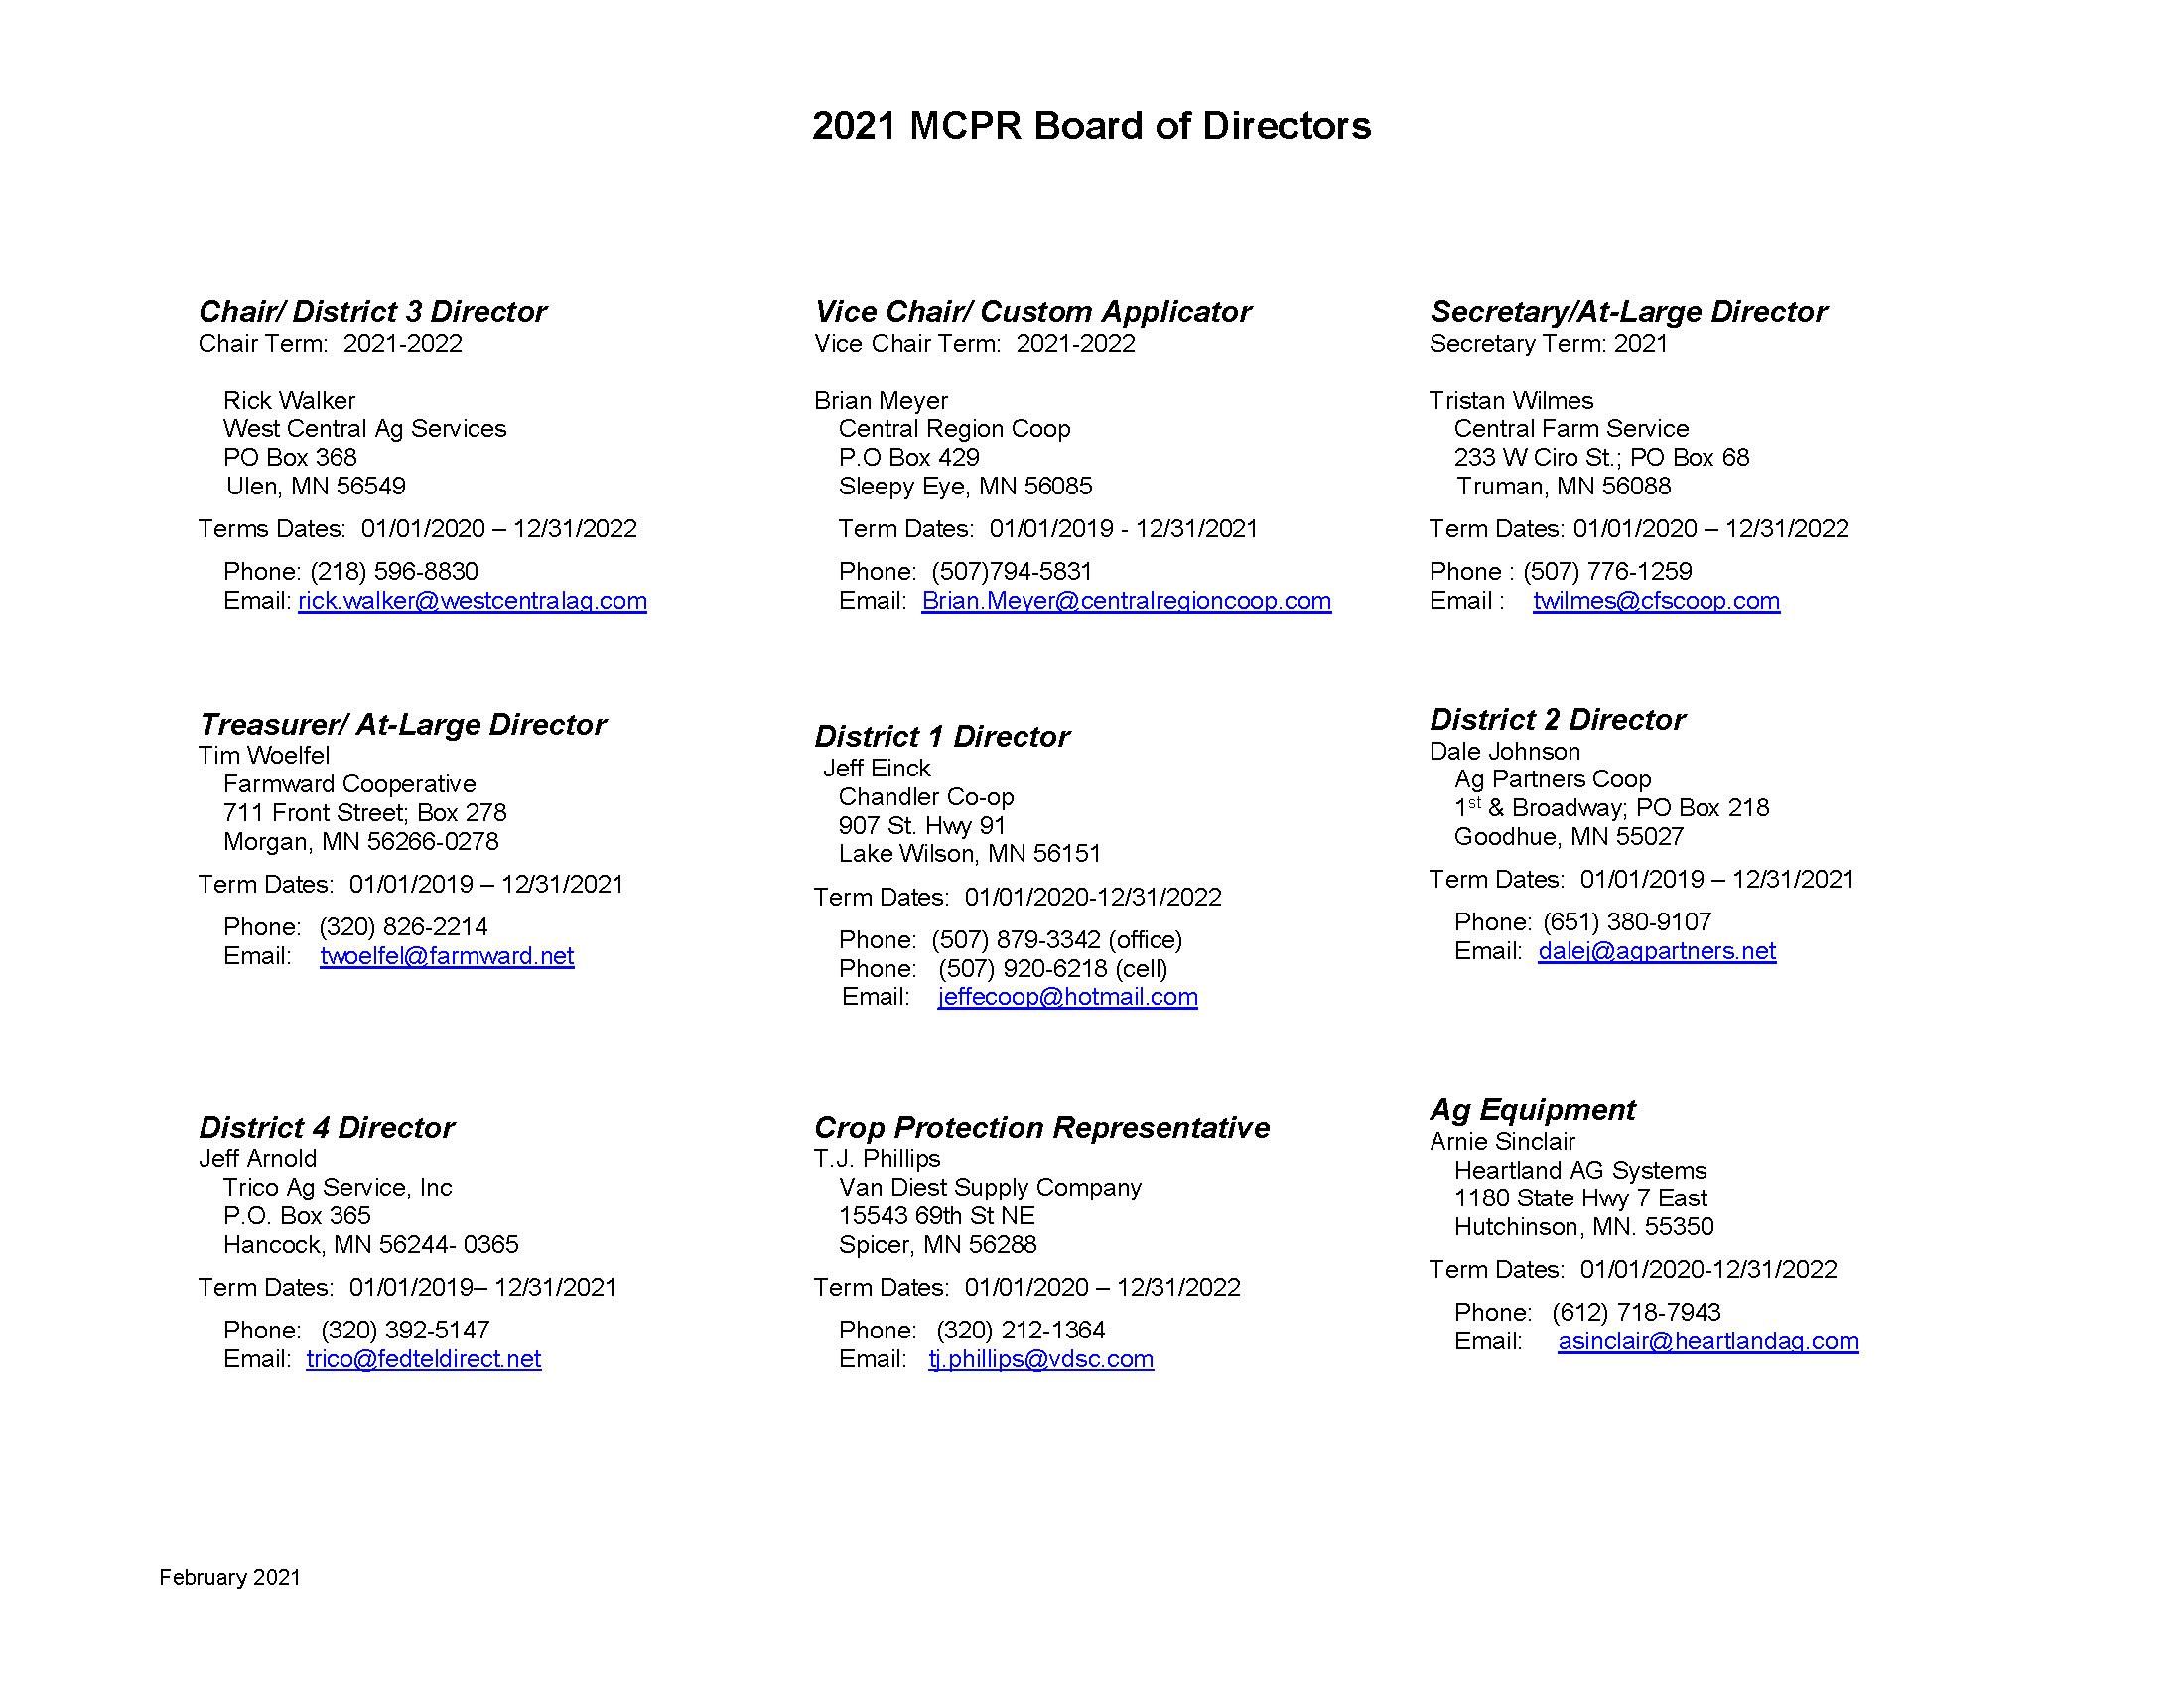 2021 MCPR Board of Directors_Page_1